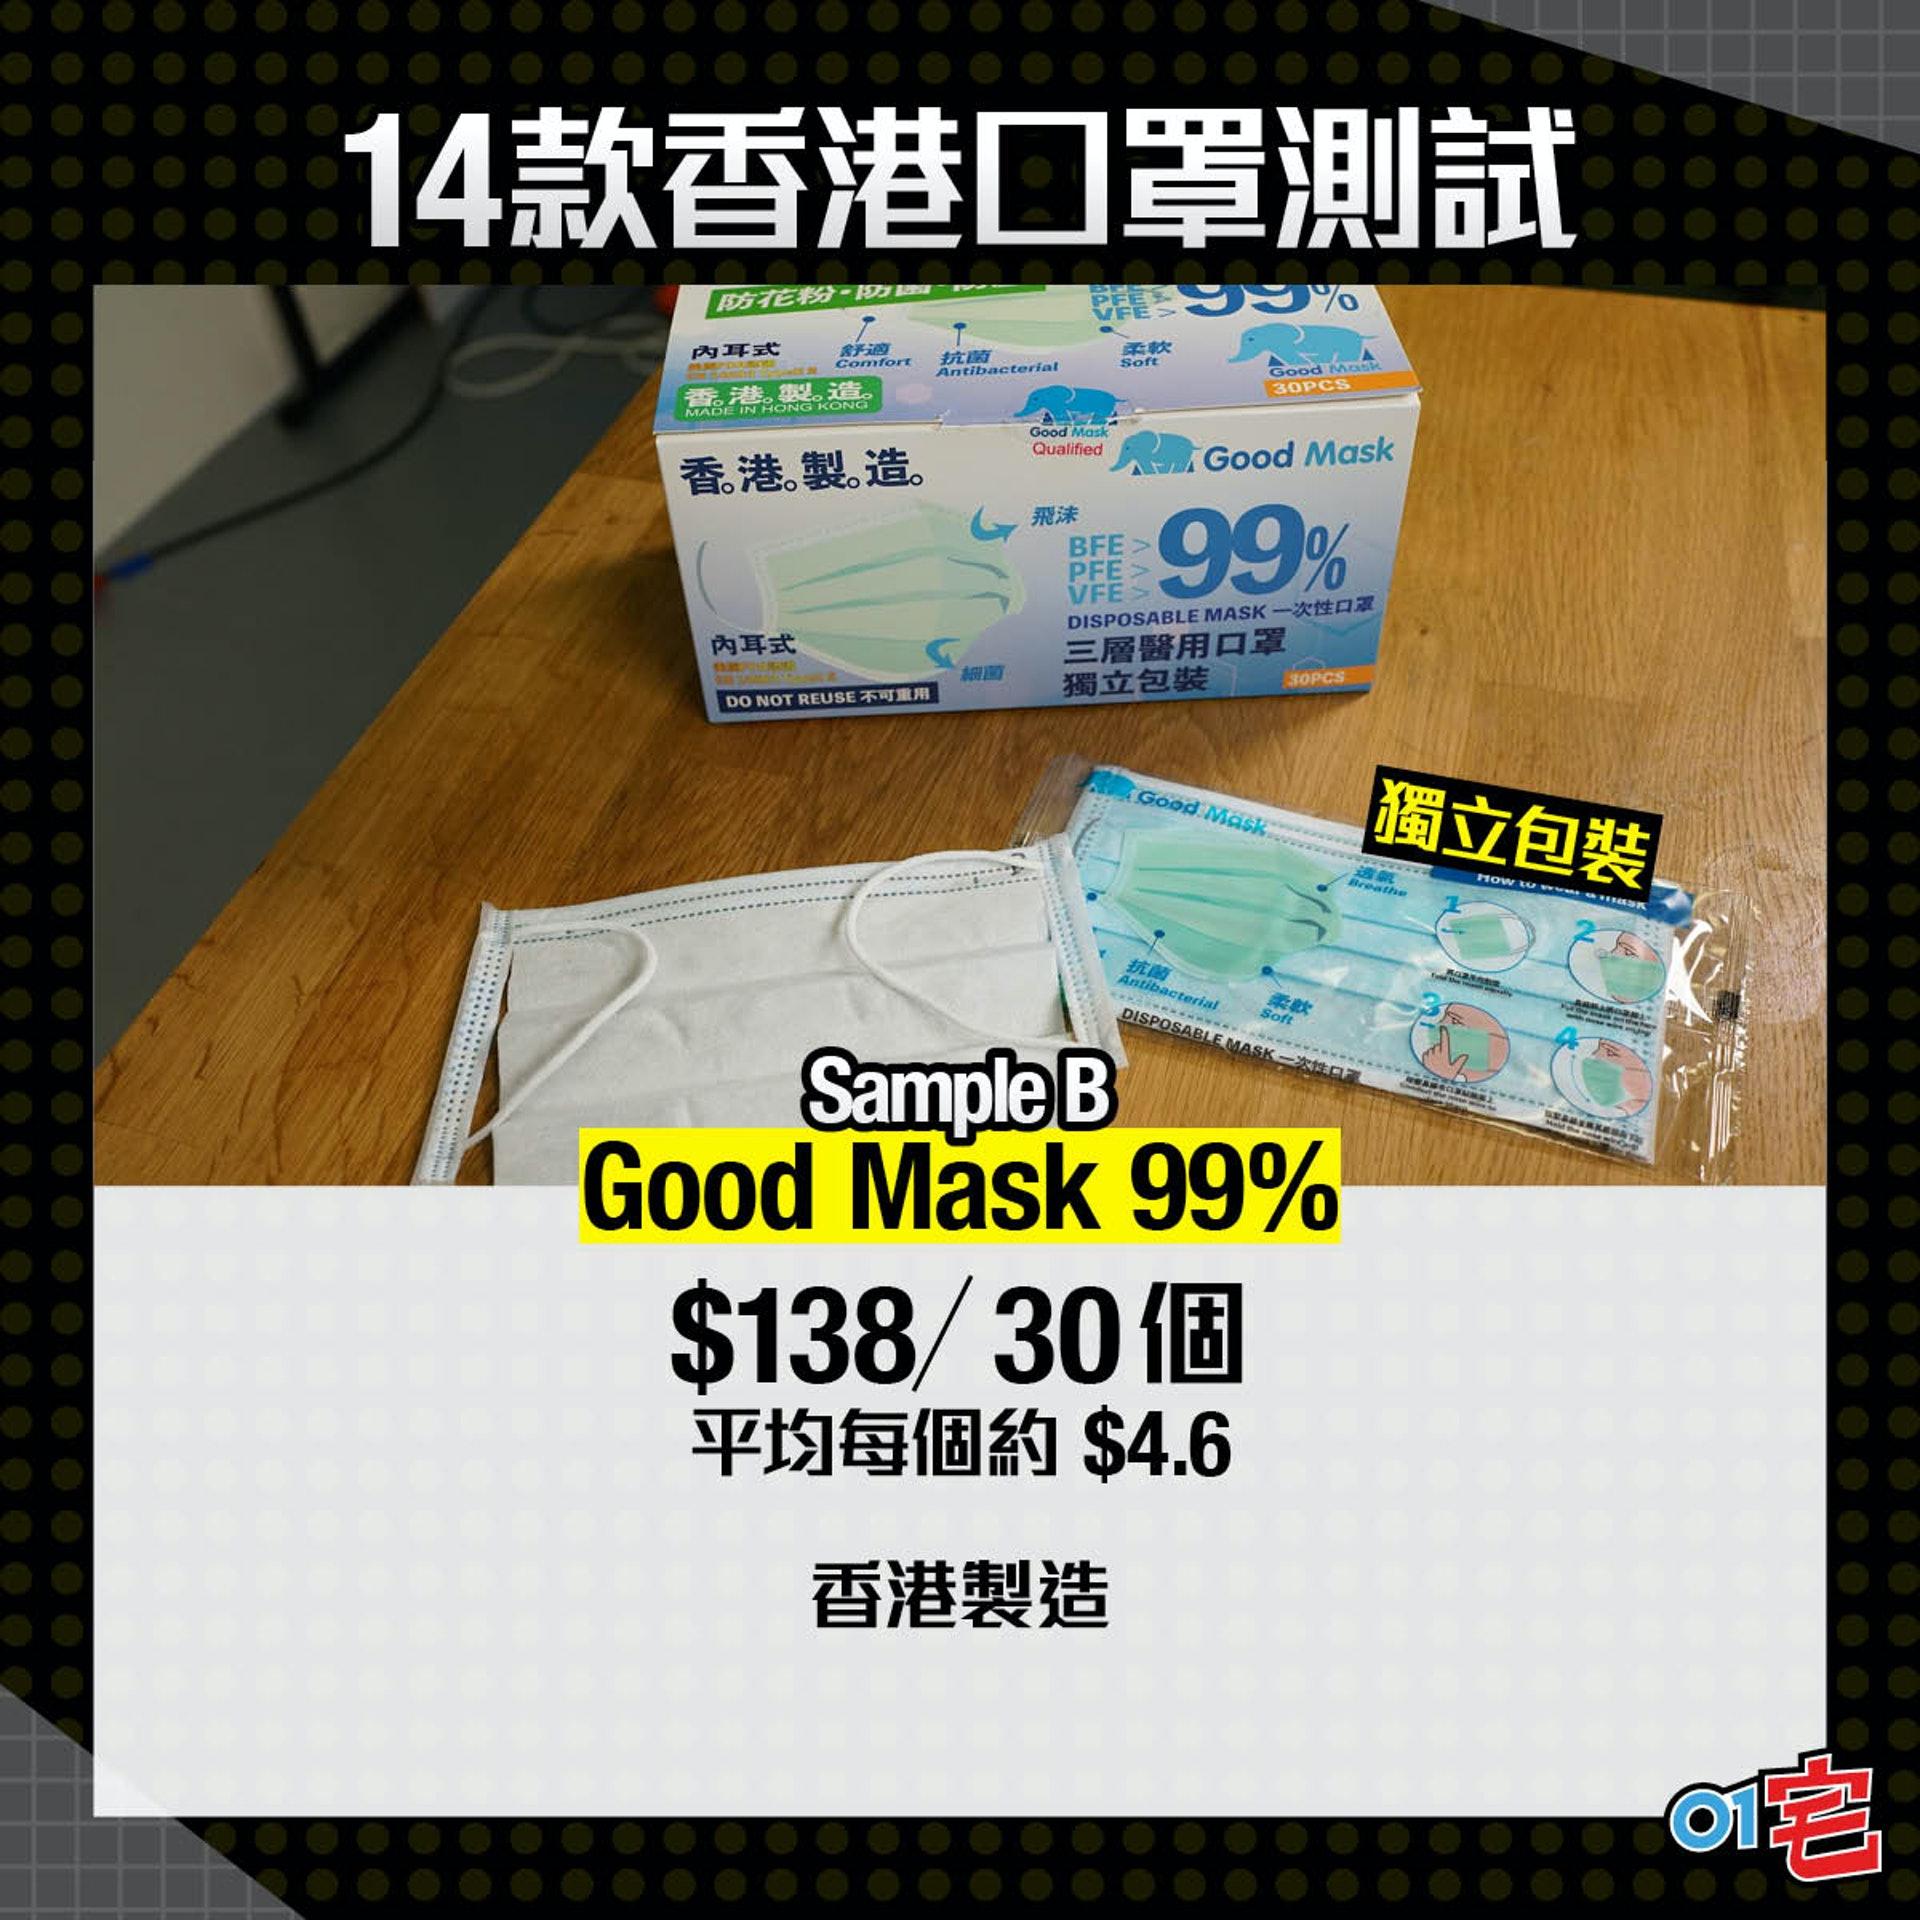 Good Mask 99%